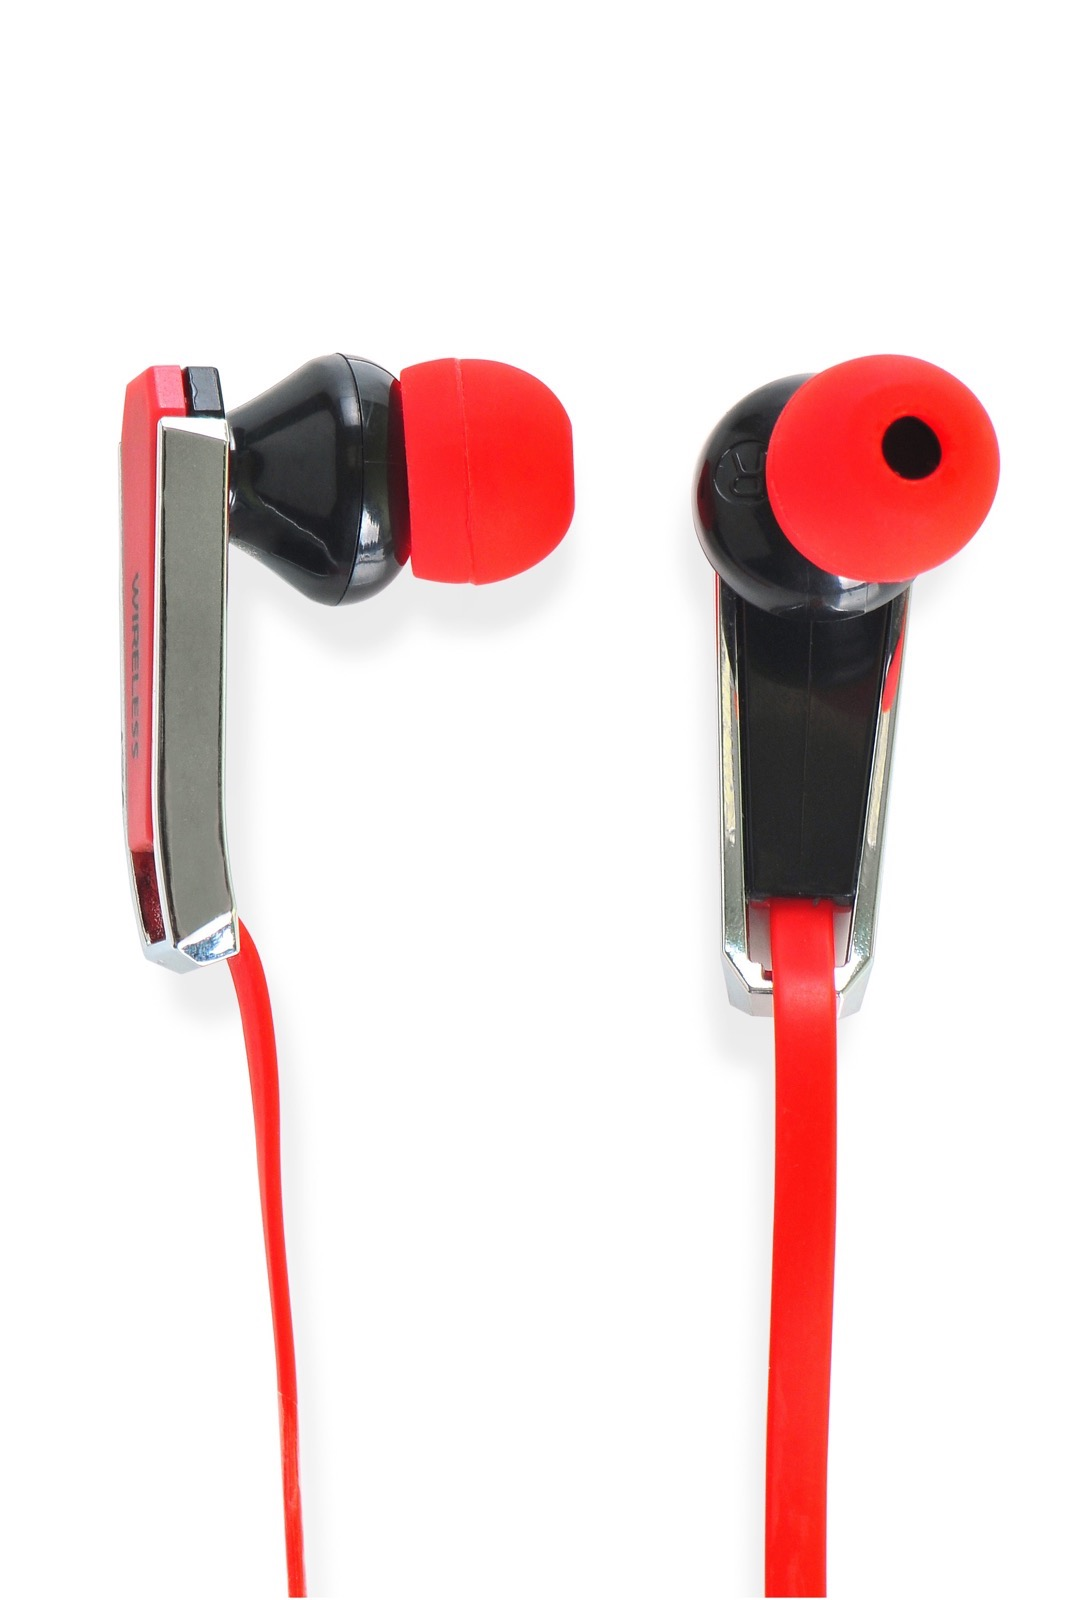 Беспроводные наушники iNeez Wireless Stereo, красный qcy qy7 wireless bluetooth 4 1 stereo sport earphone with mic